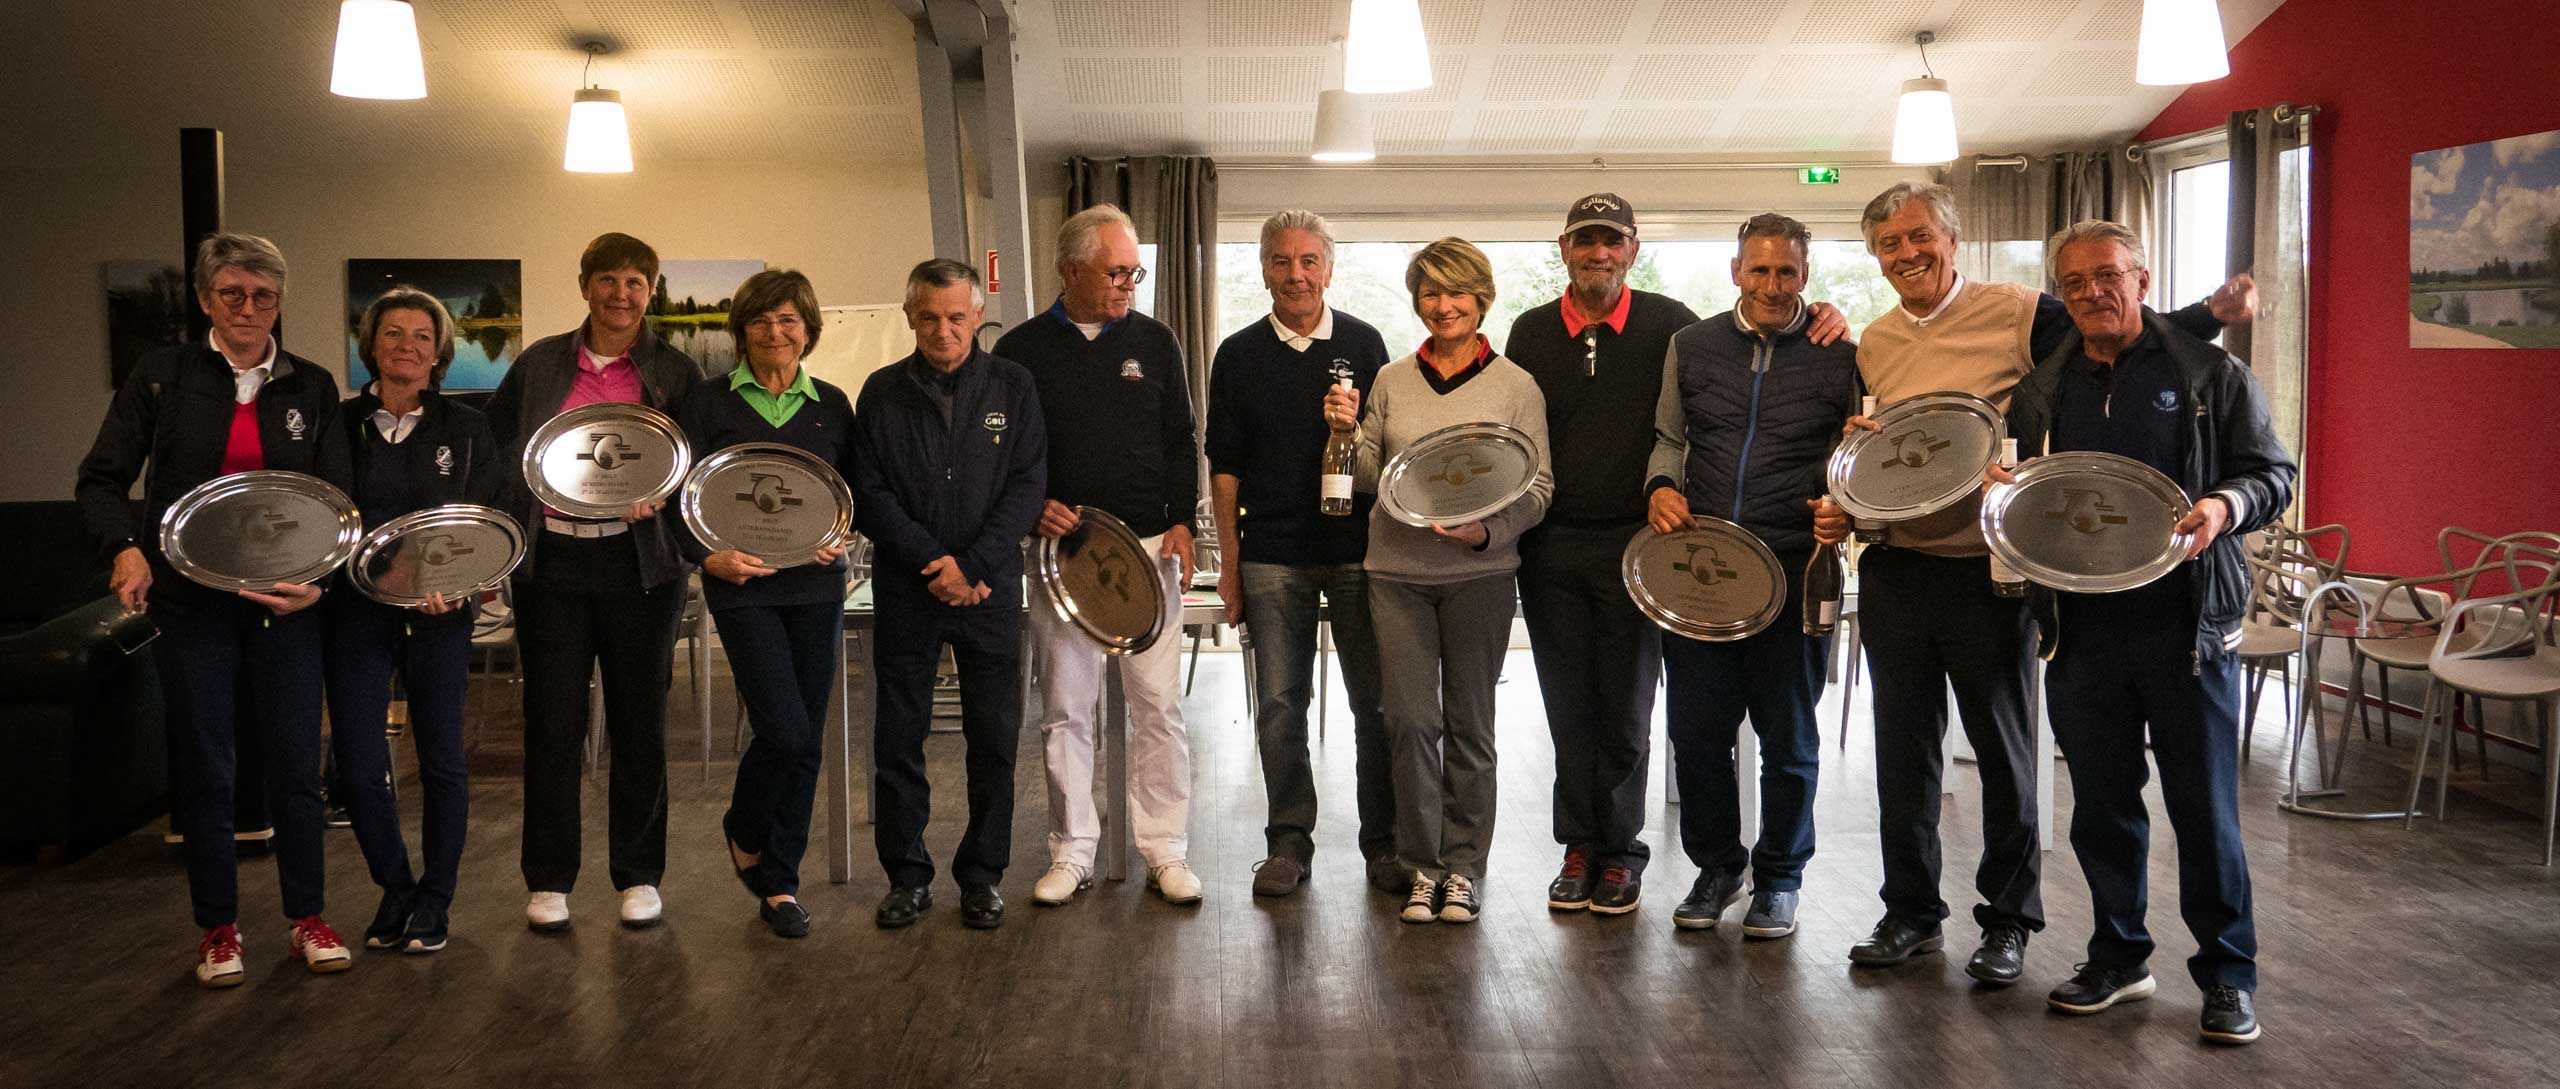 Trophee Seniors 2019 Forez T2 62